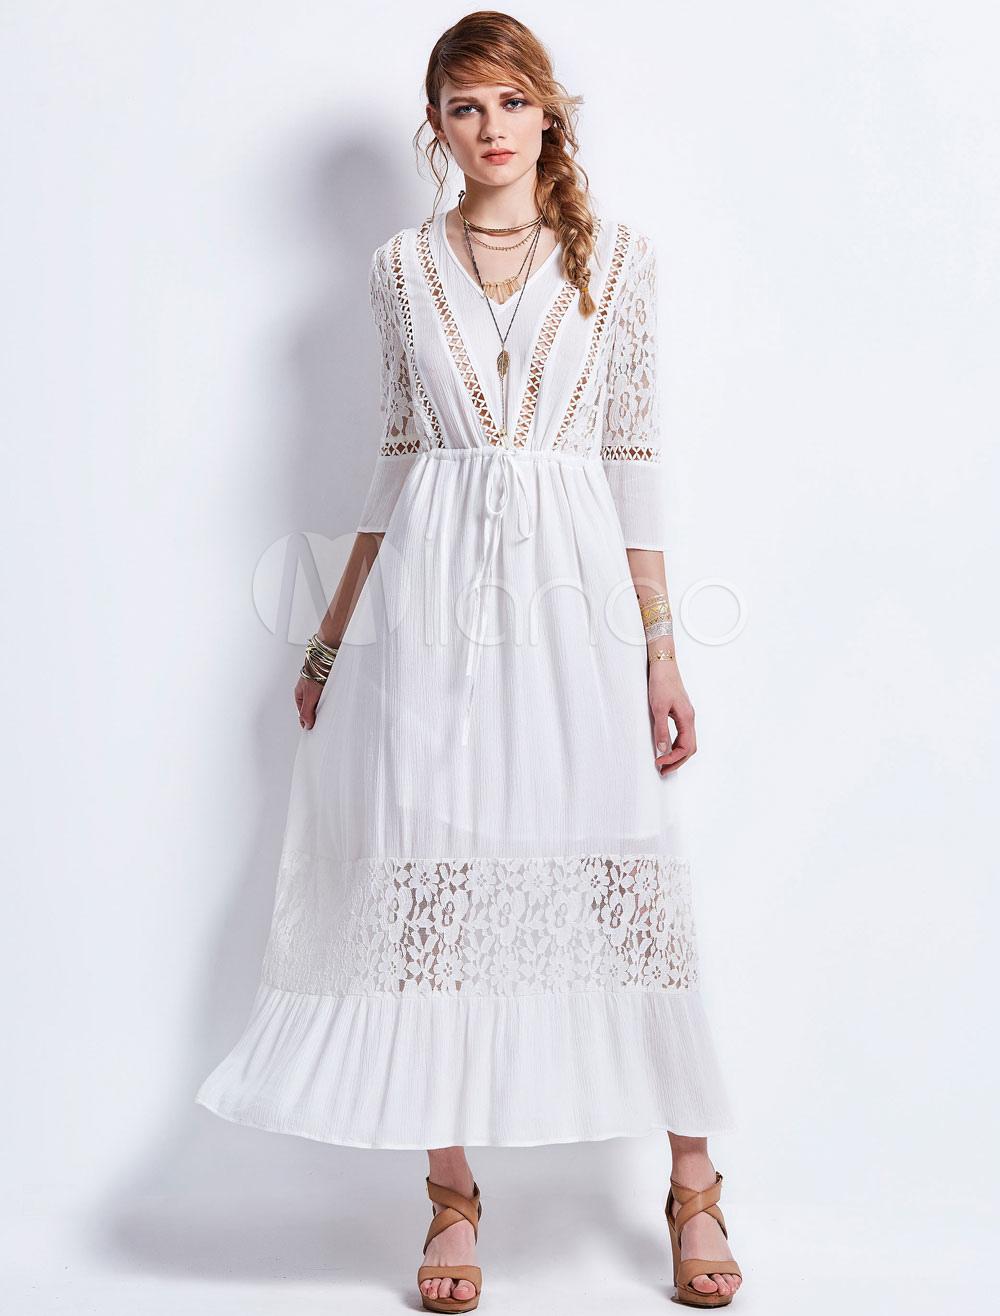 White Maxi Dress Women Long Sleeve V Neck Semi Sheer Summer Dresses (Women\\'s Clothing Maxi Dresses) photo